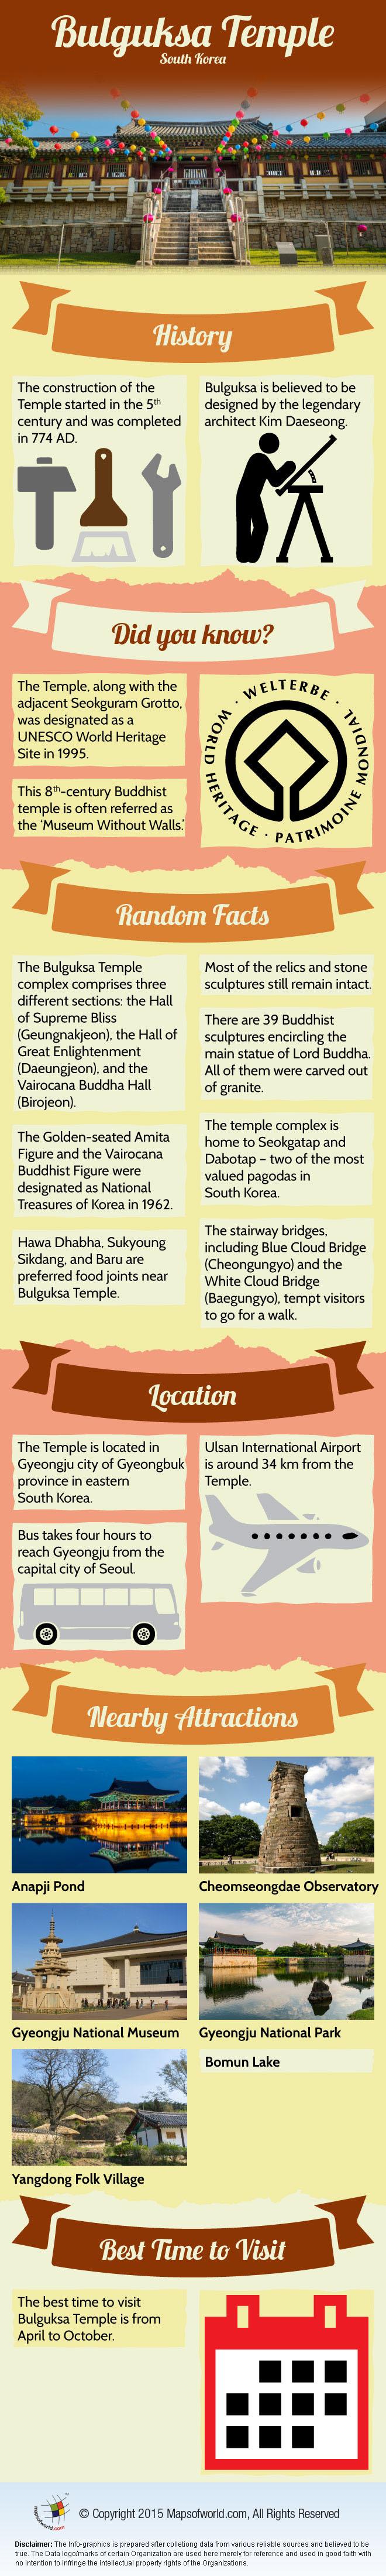 Bulguksa Temple Infographic